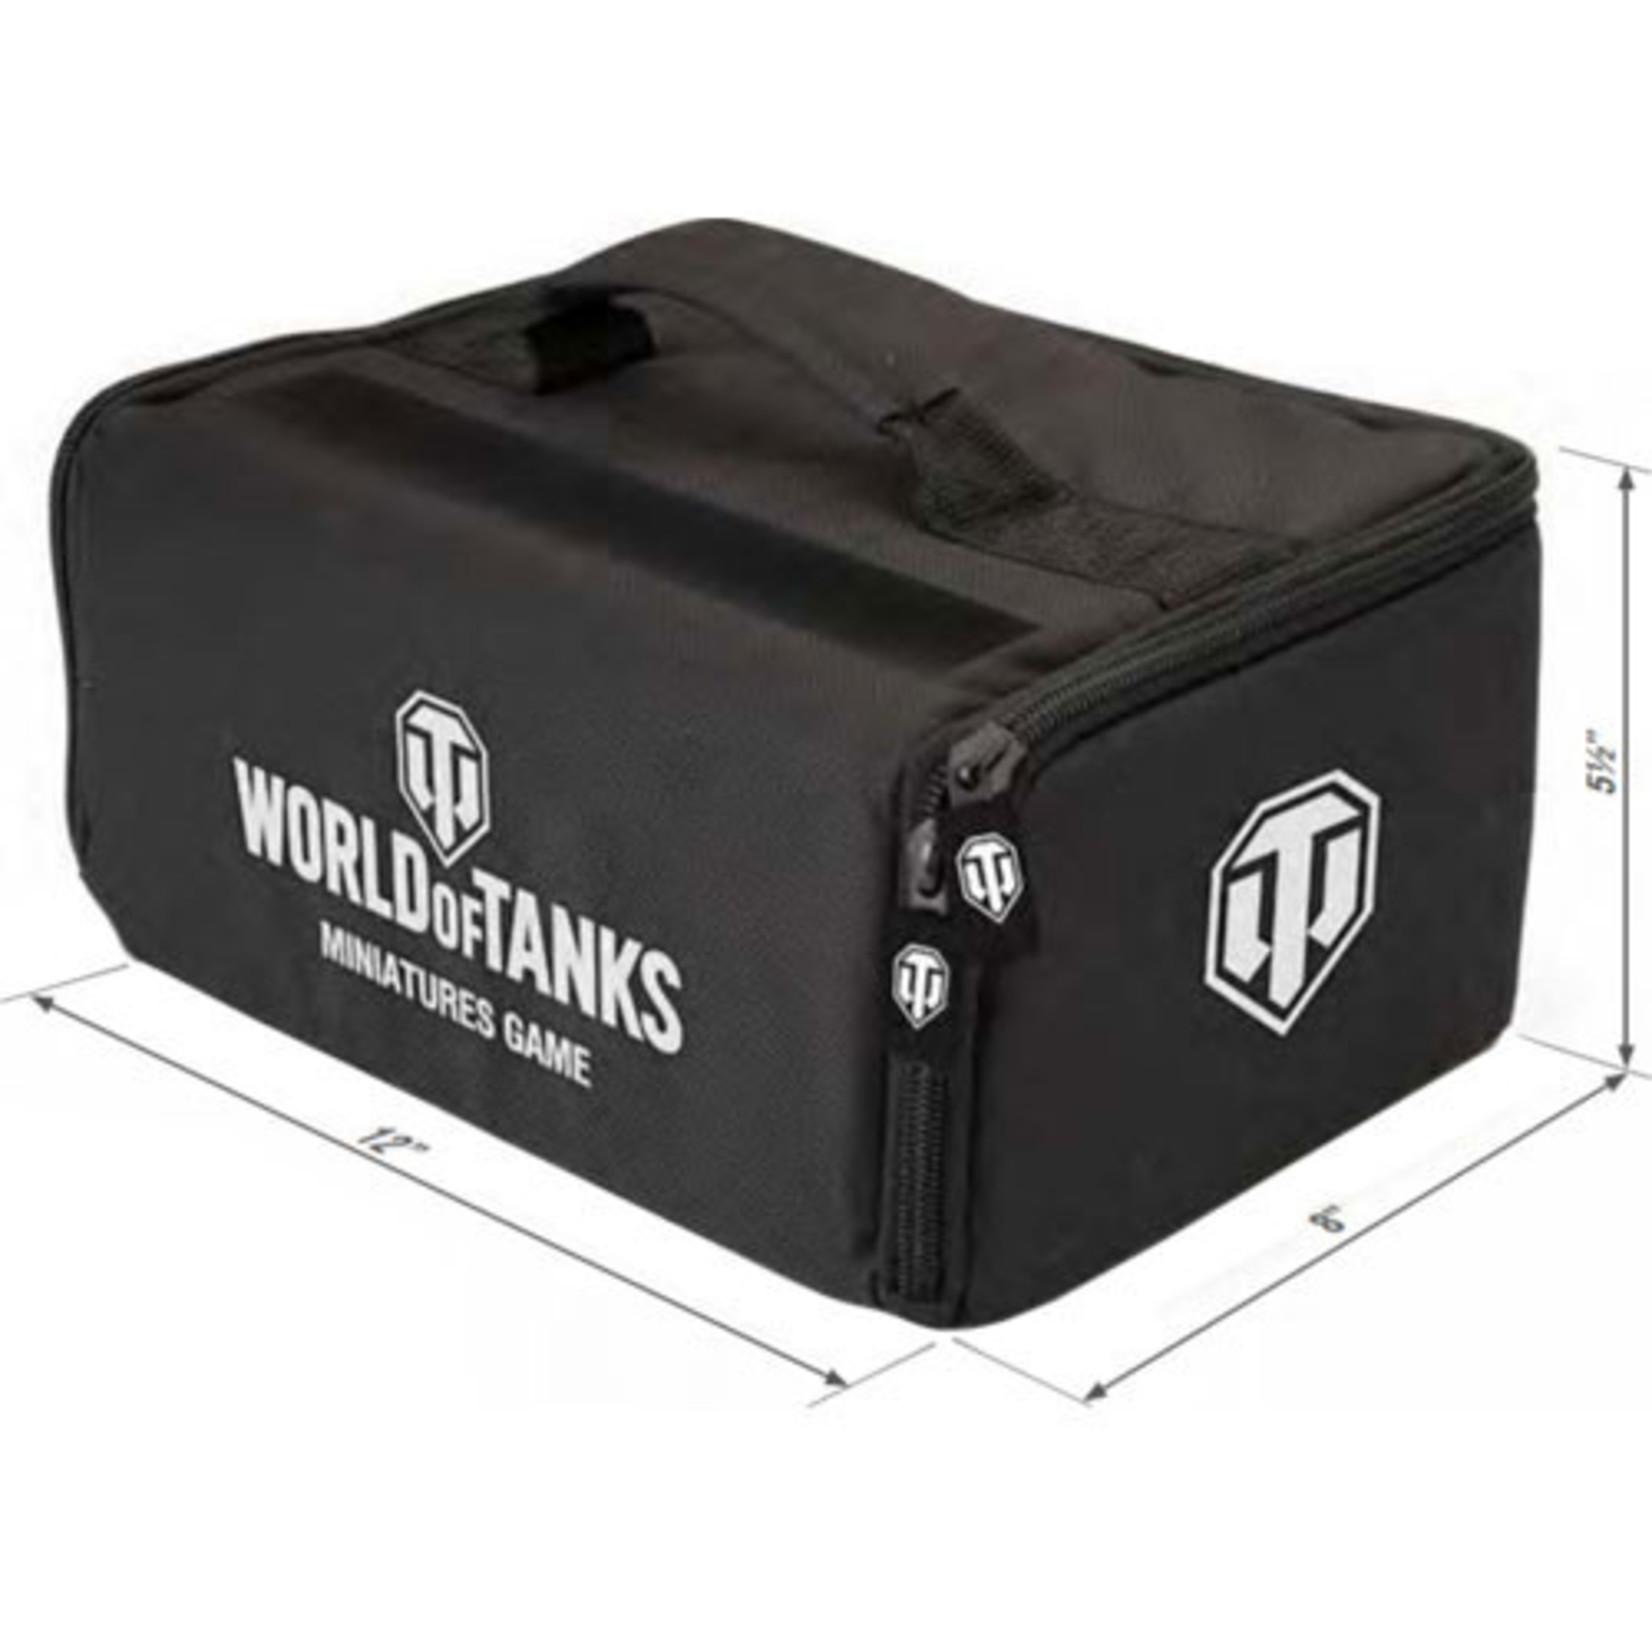 World of Tanks World of Tanks Garage Bag